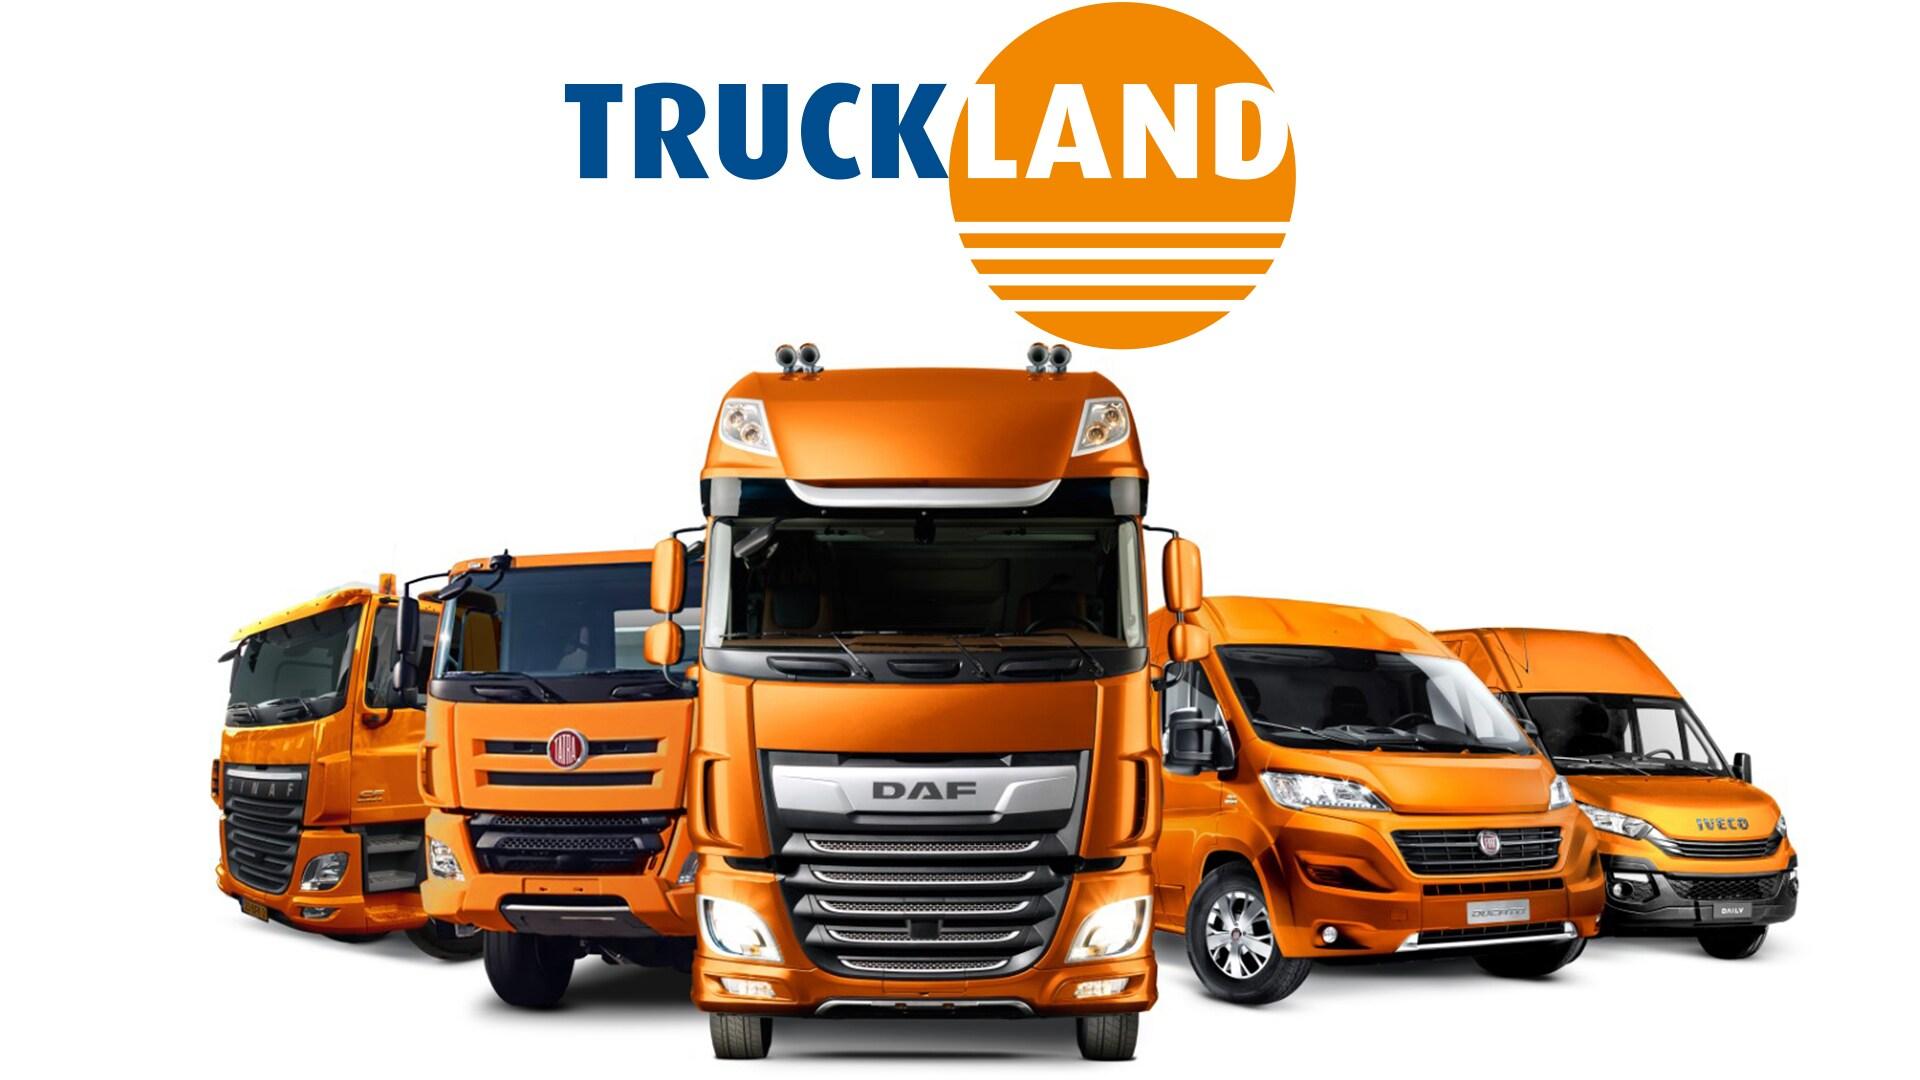 Truckland